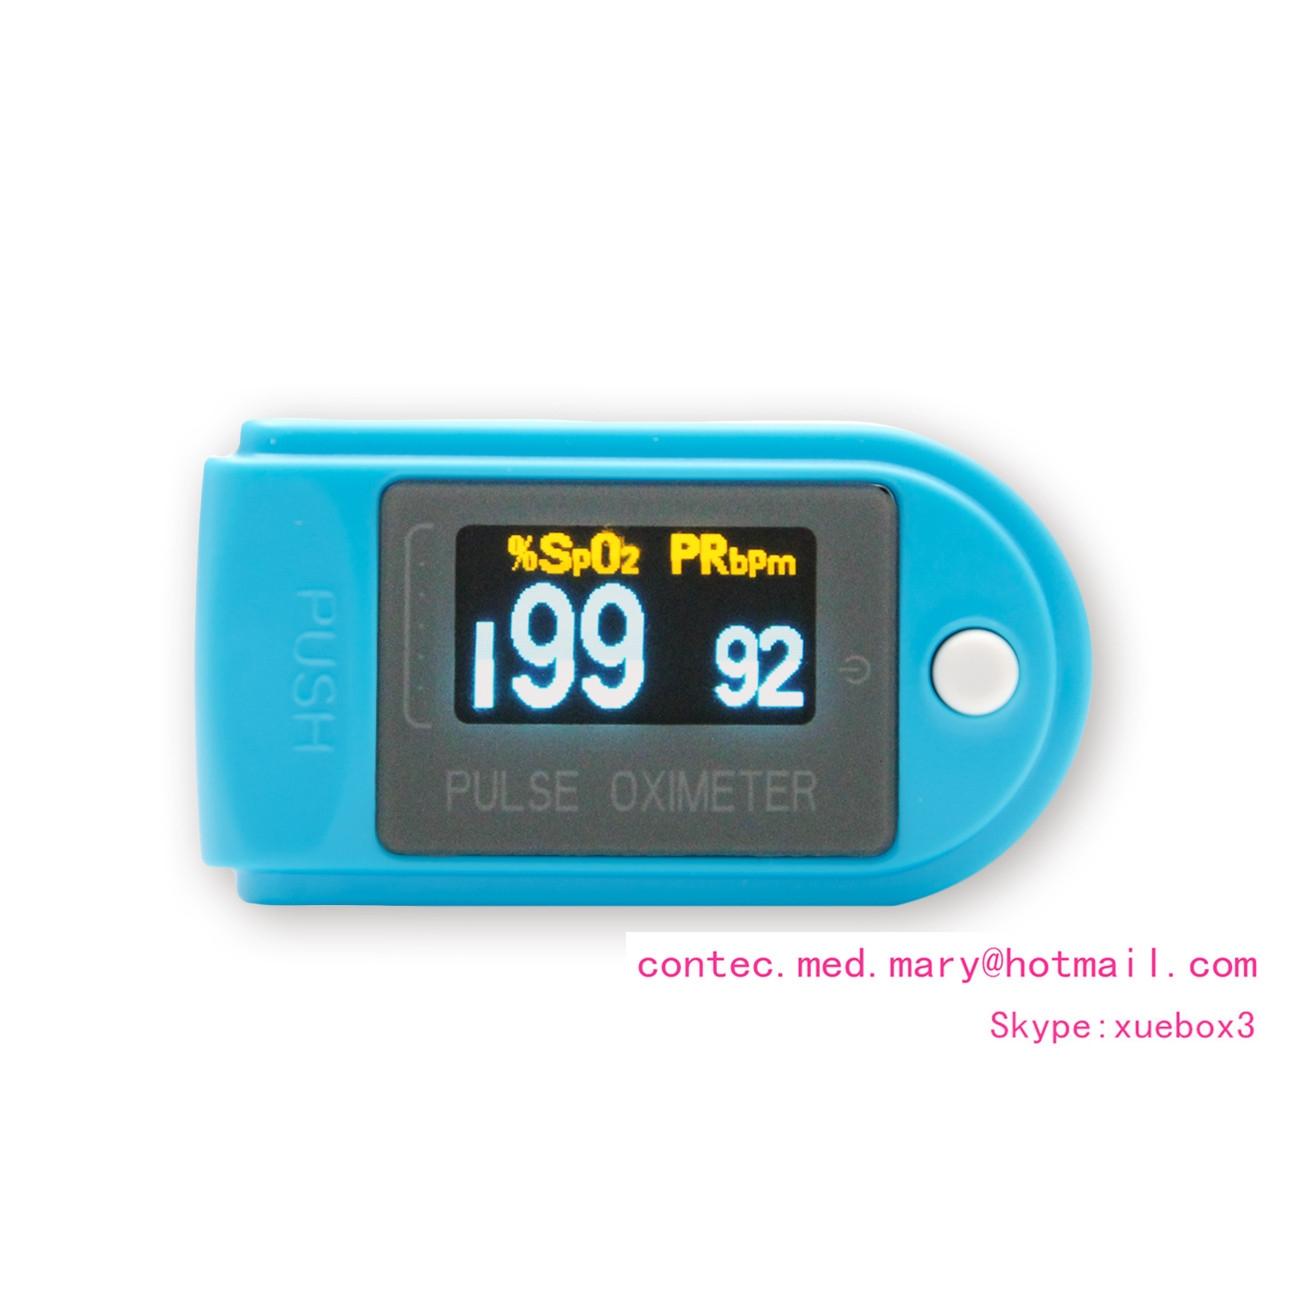 ... Finger tip pulse oximeter, blood oxygen saturation monitor,PR SPO2